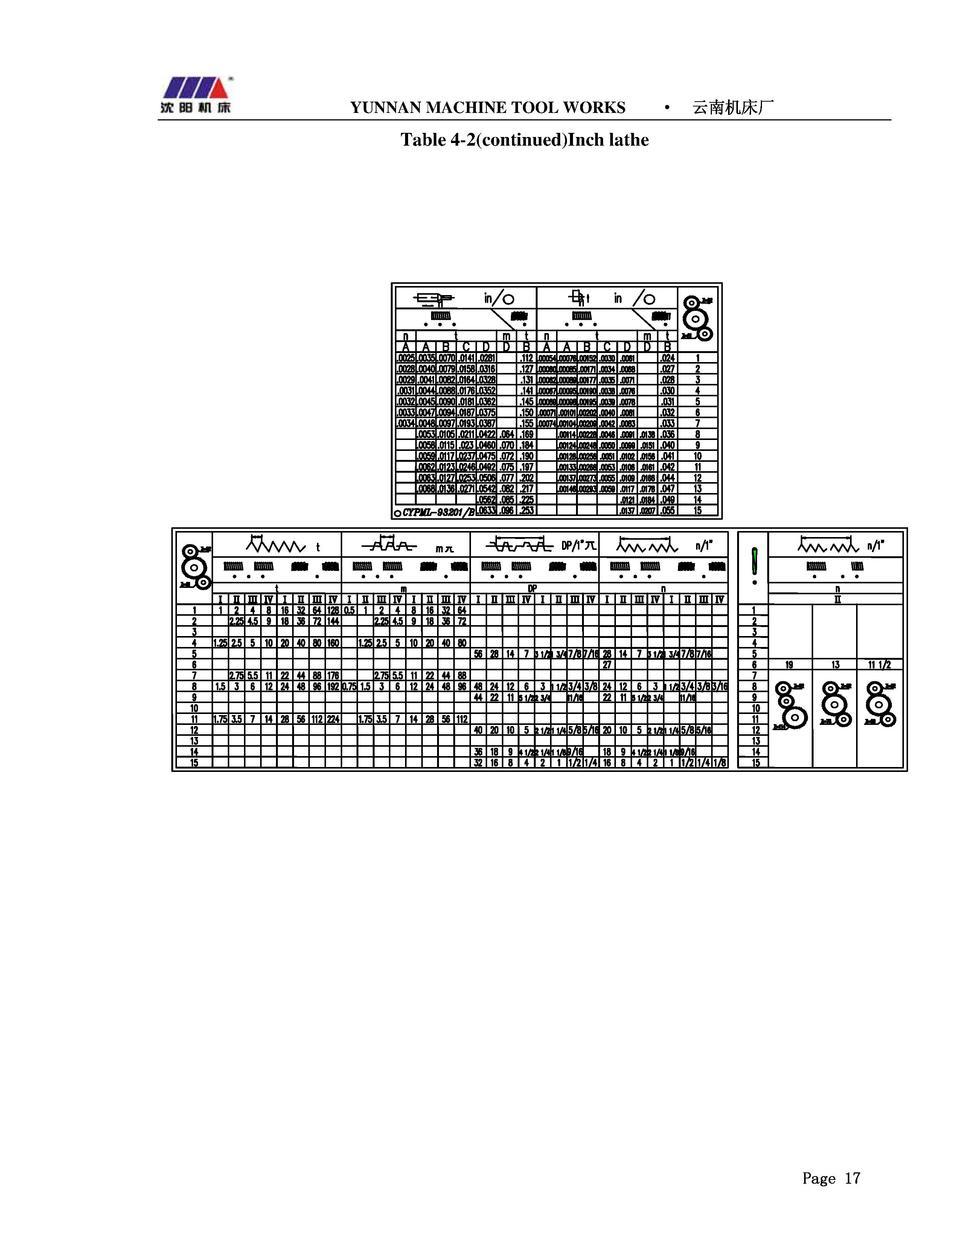 Manual Yunnan CYPML Lathe Simplebooklet